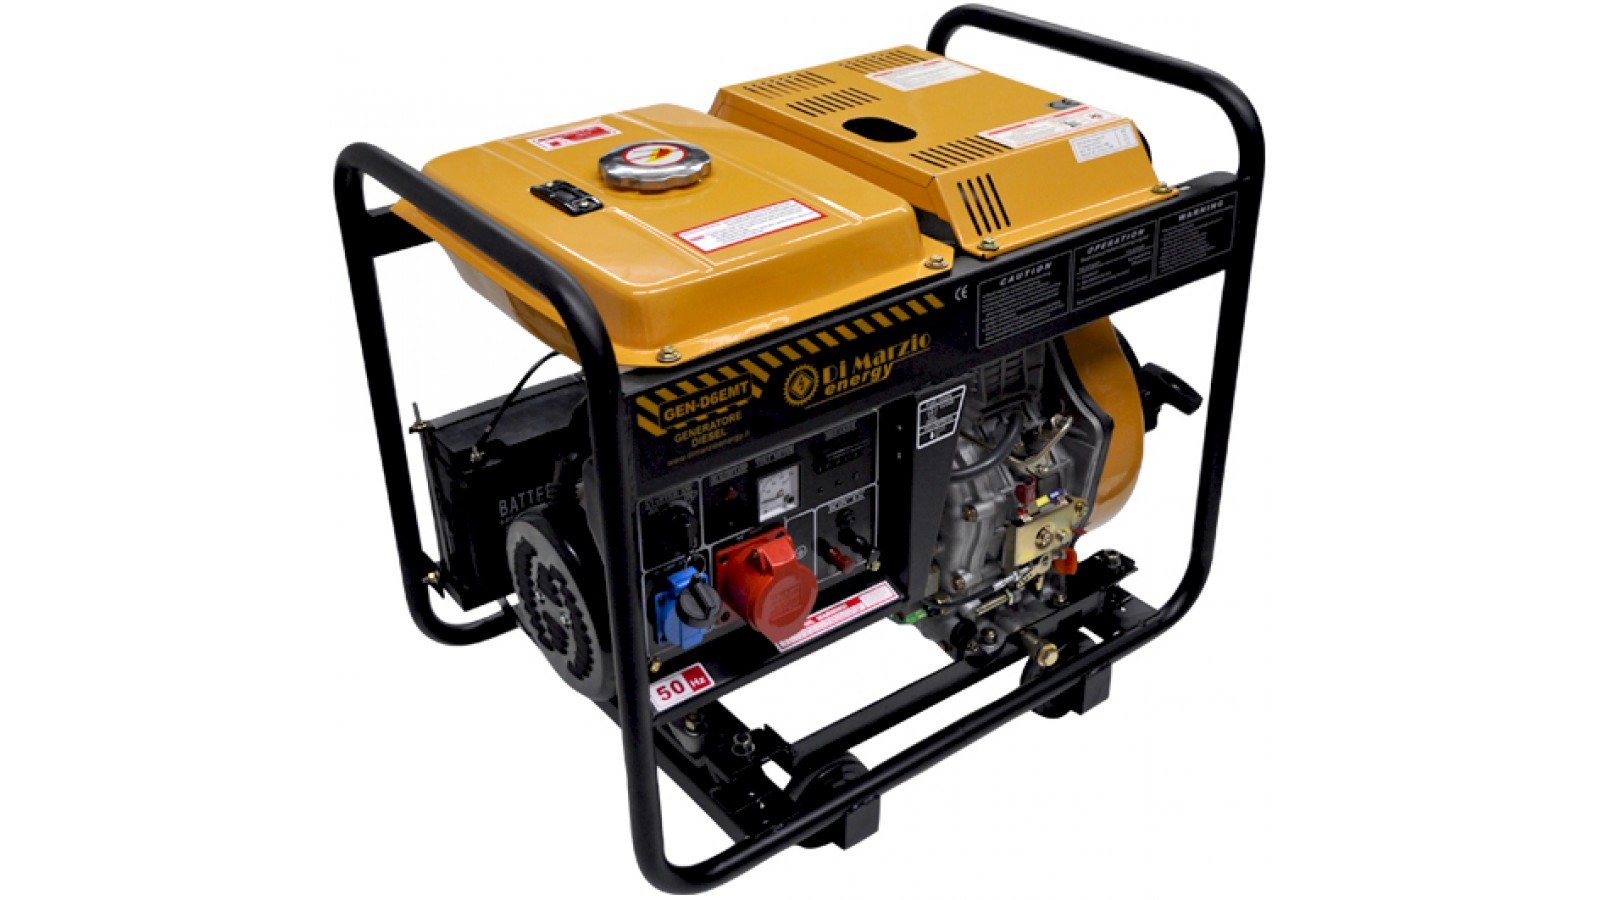 Gruppo elettrogeno 6 kw dispositivo arresto motori for Amazon gruppi elettrogeni